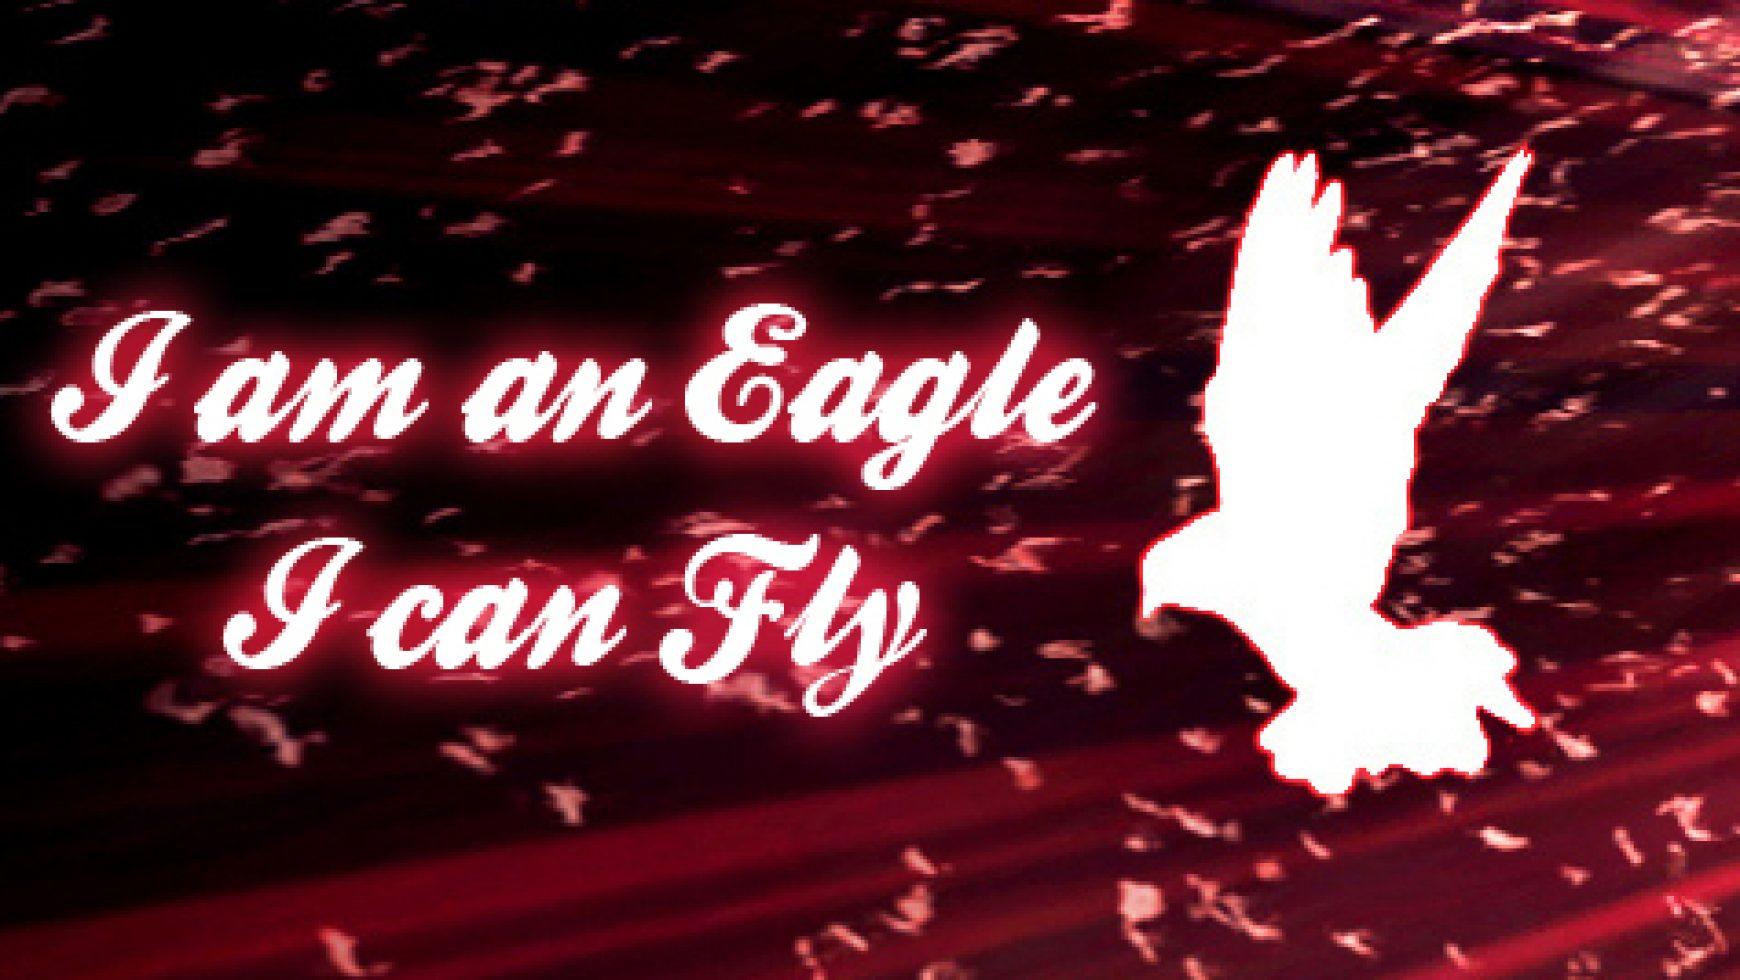 I am an Eagle I can Fly